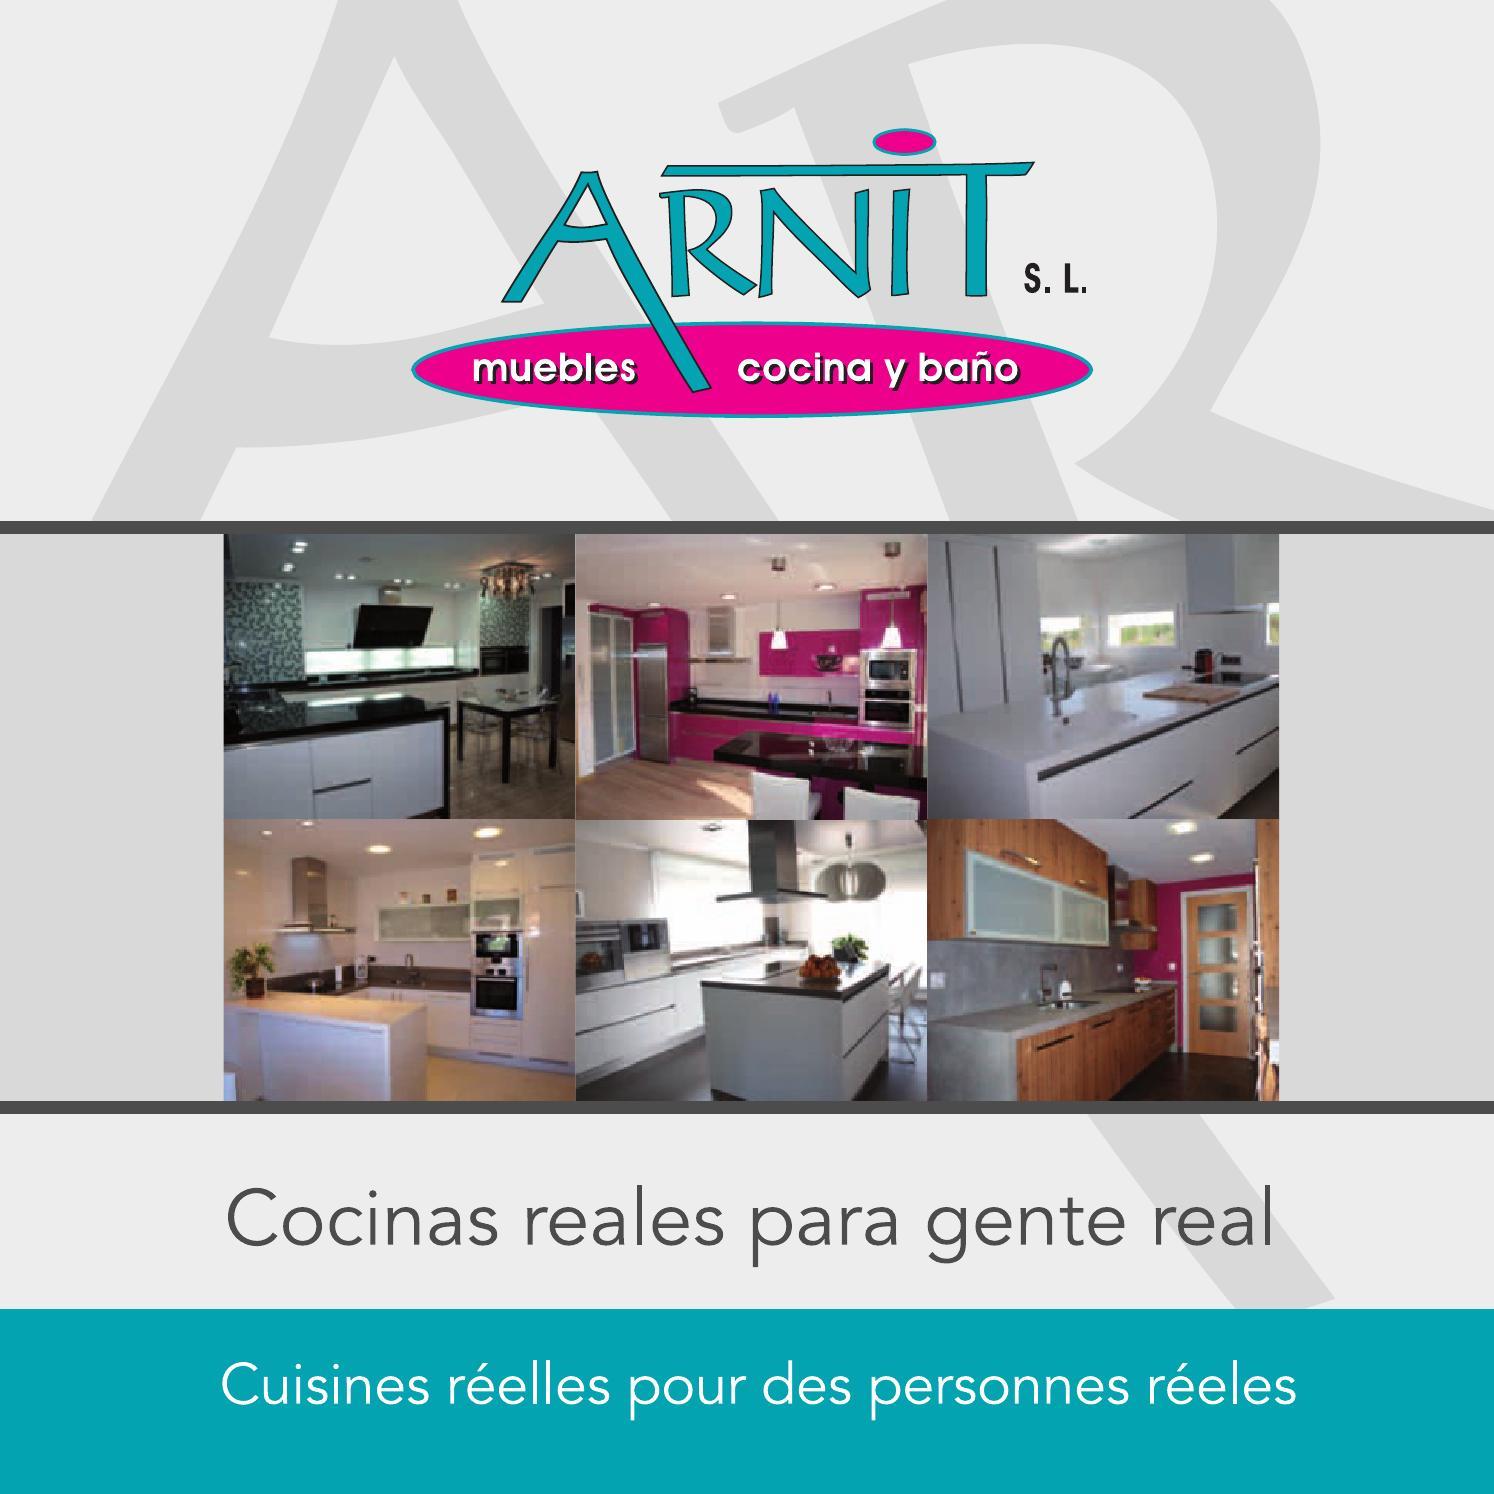 Catalogo muebles arnit 2012 by rocastg - issuu